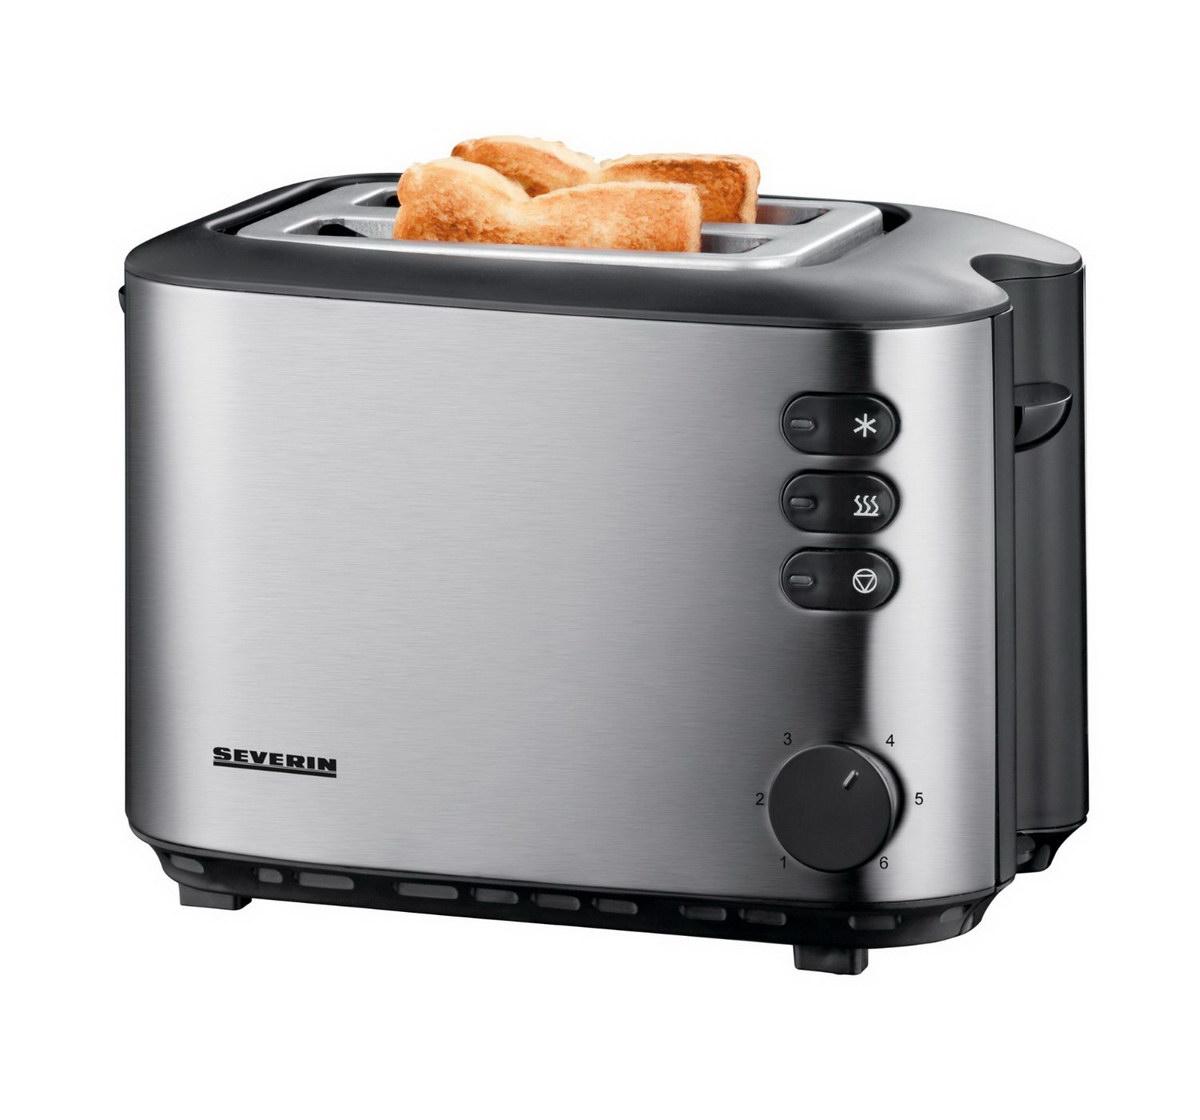 Toaster Bestseller 2018 | Test Die besten Toaster edelstahl Retro ...